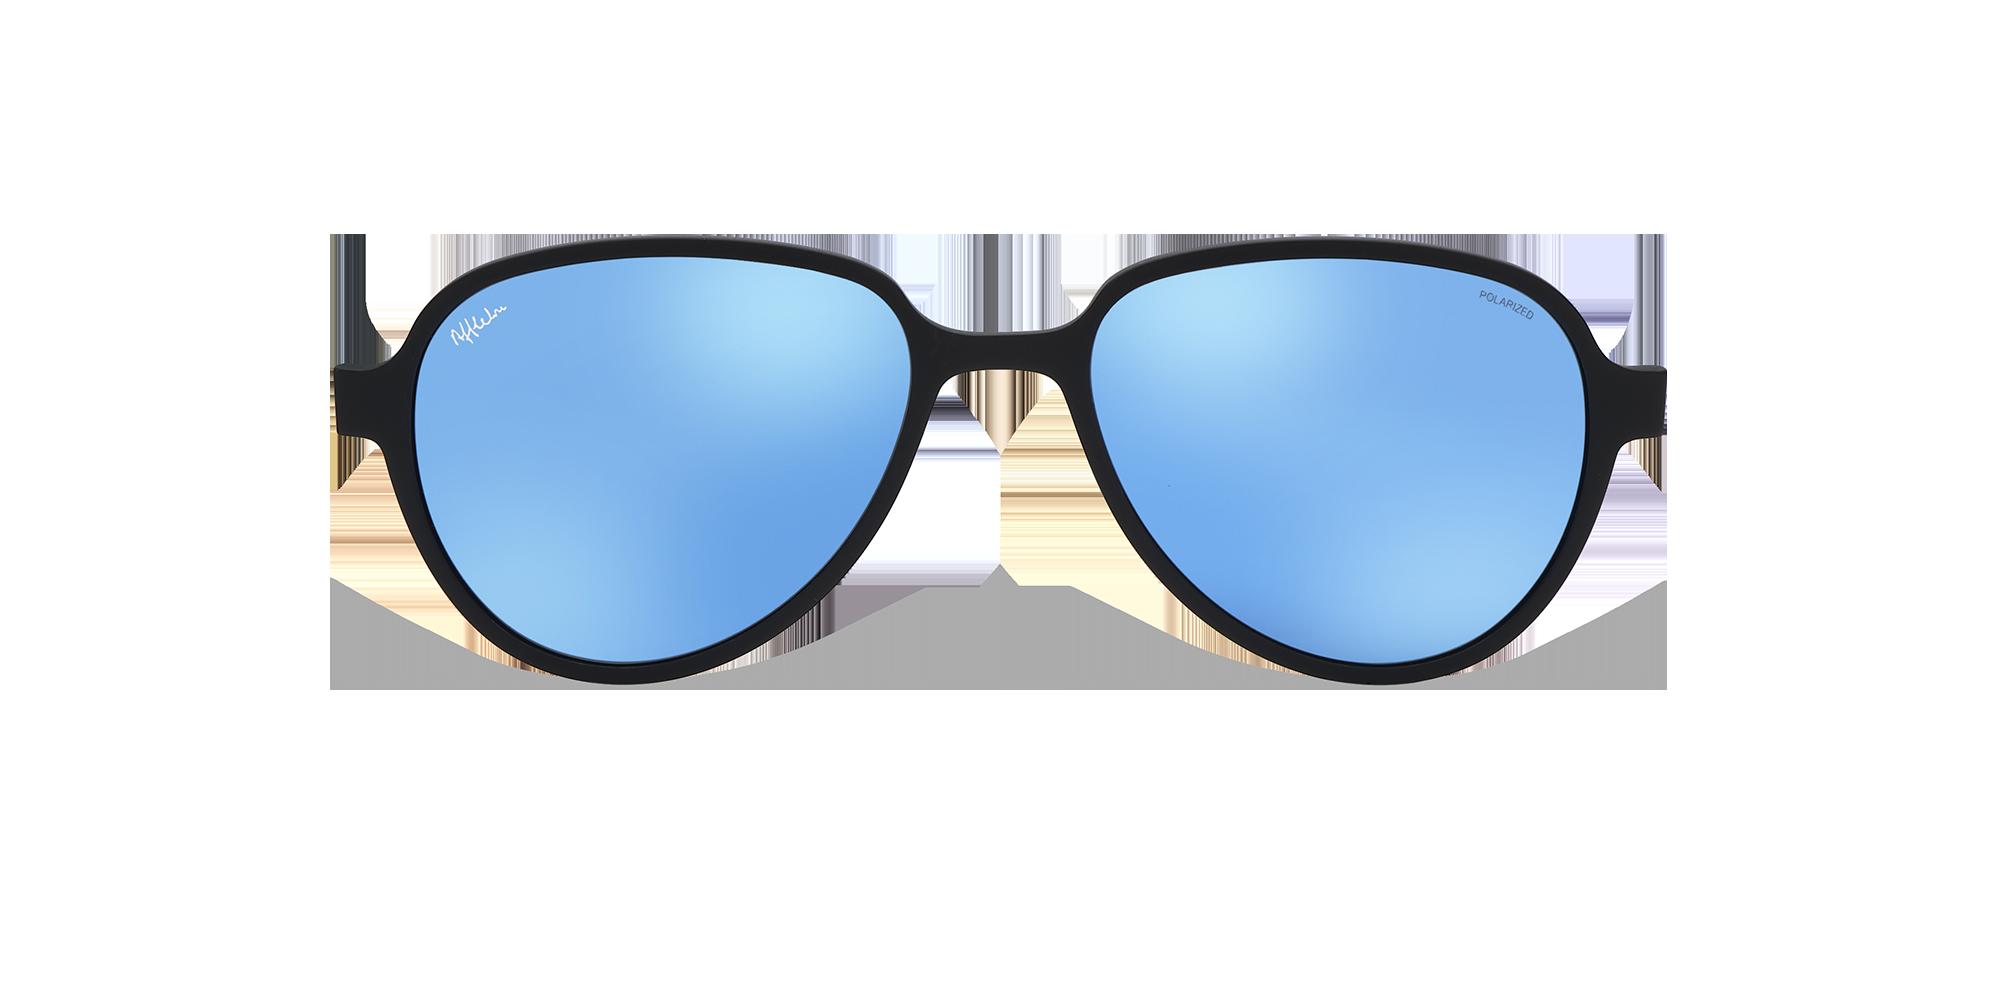 afflelou/france/products/smart_clip/clips_glasses/TMK43PRBK015417.png